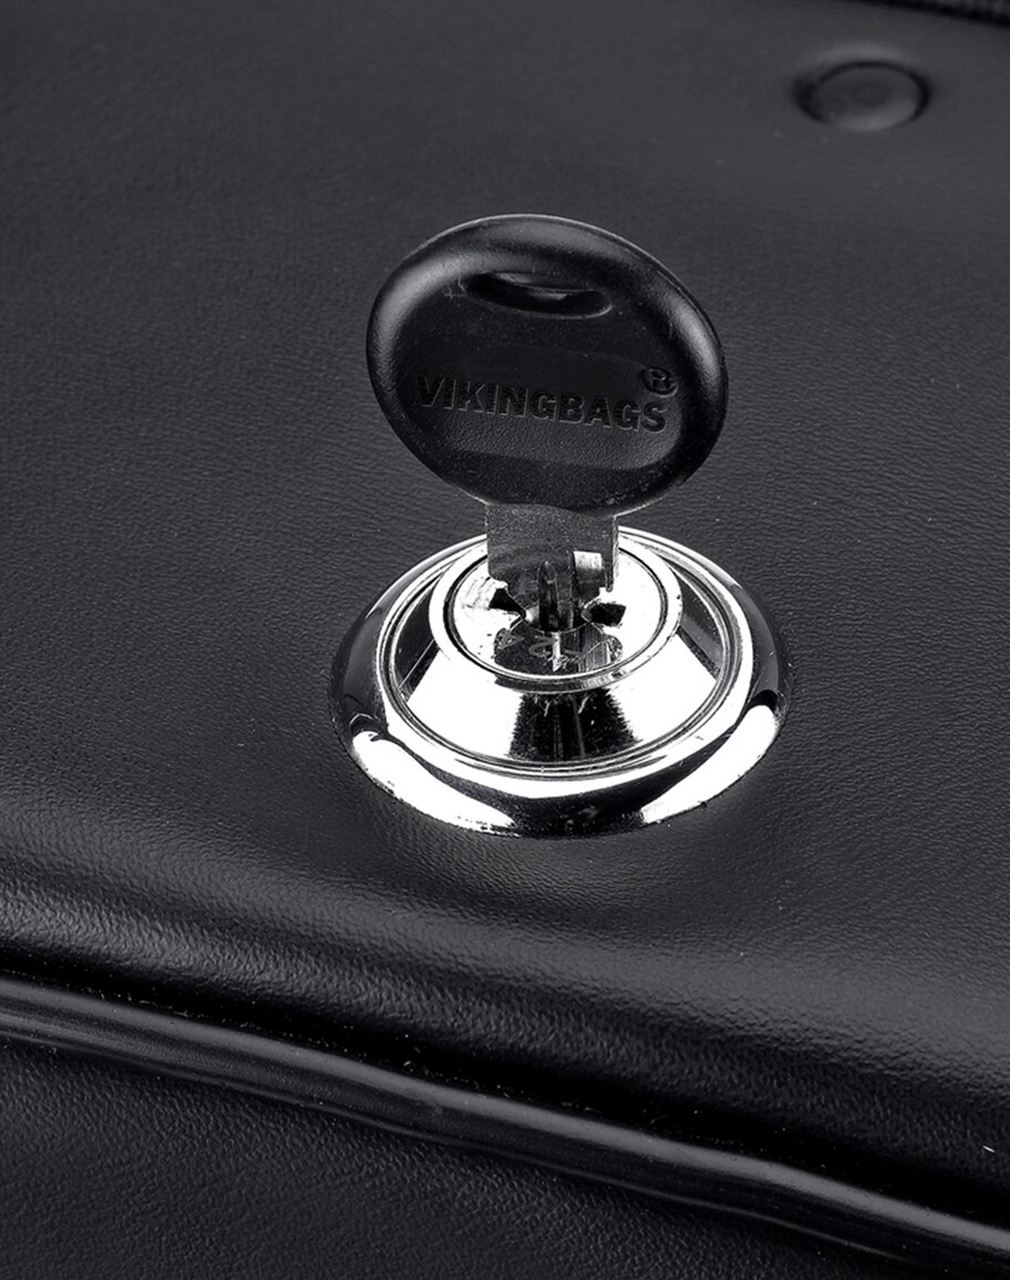 Honda 750 Shadow Phantom Medium Charger Single Strap Motorcycle Saddlebags lock key view